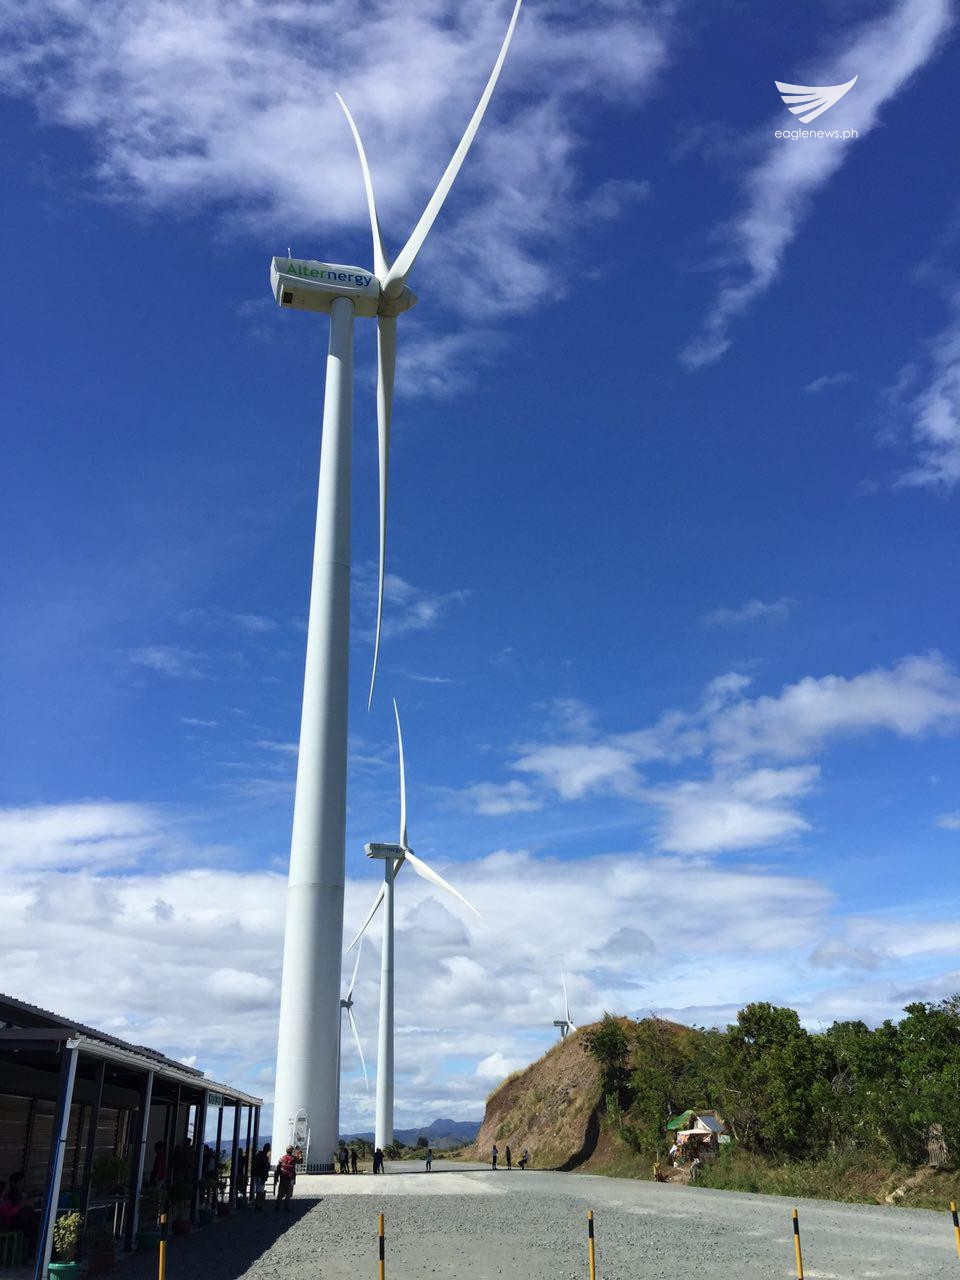 Windmills in Pililla, Rizal. (Photo contributed by Rolando Inciong)